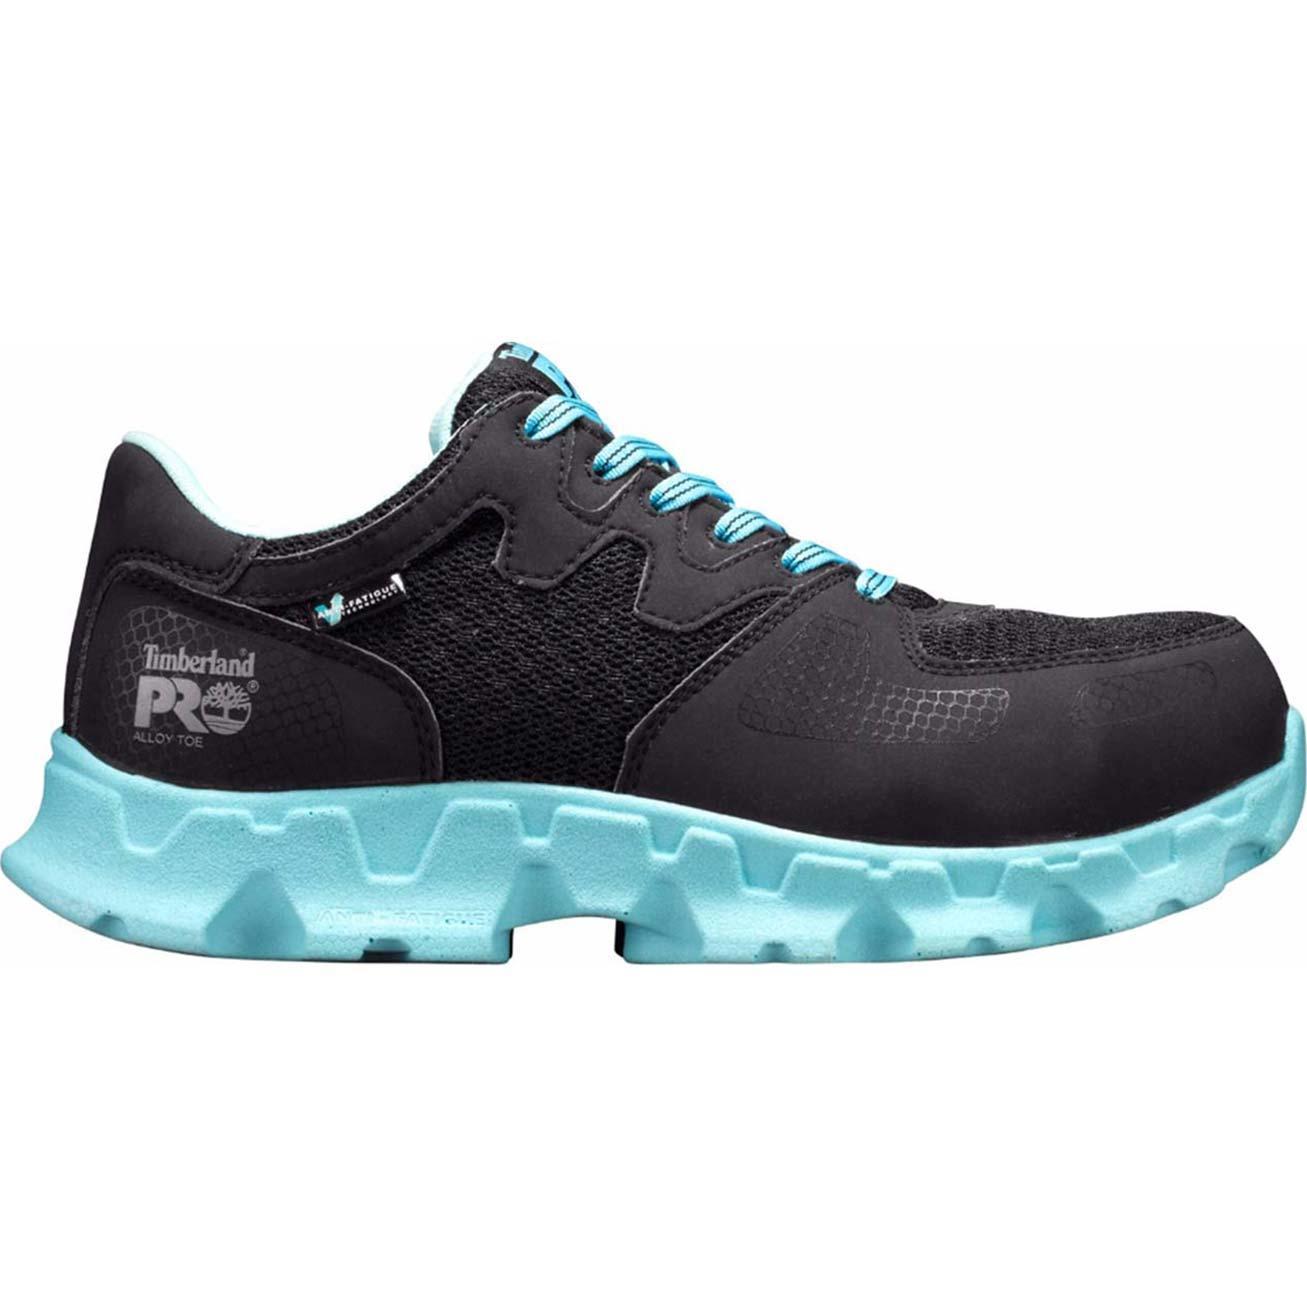 Timberland Pro Powertrain Alloy Toe Static Dissipative Work Athletic Shoe